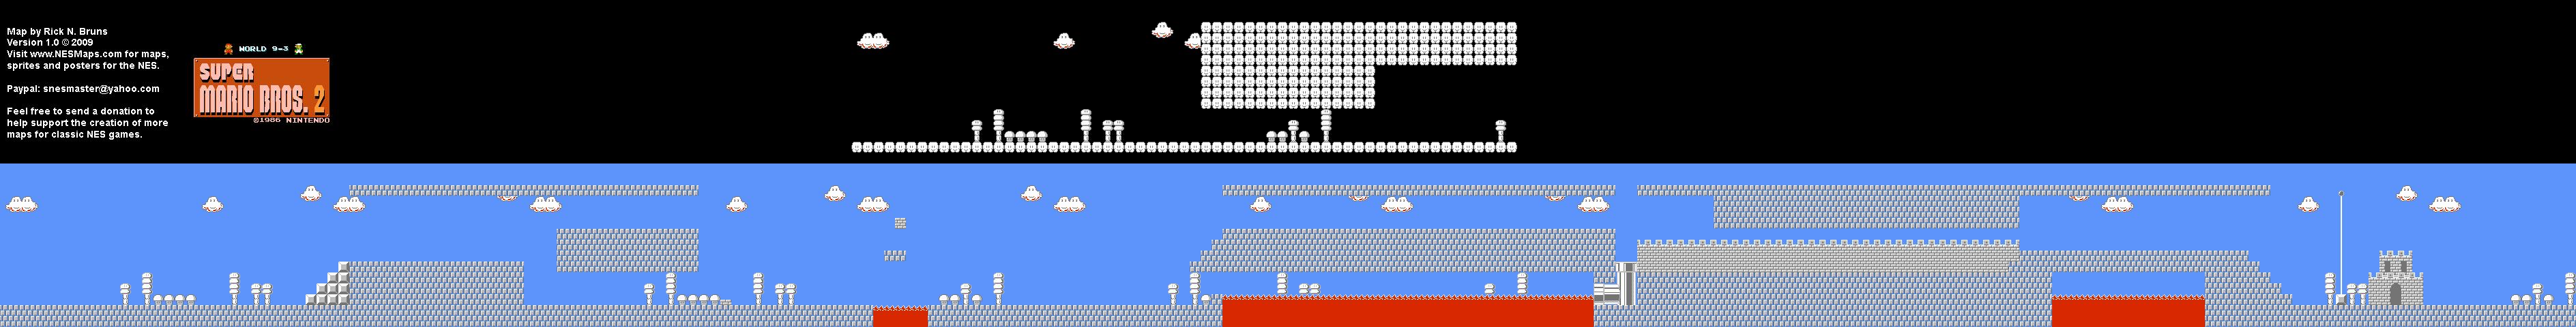 Super Mario Bros 2 Japan The Lost Levels World 9 3 Nintendo Nes Famicom Fds Background